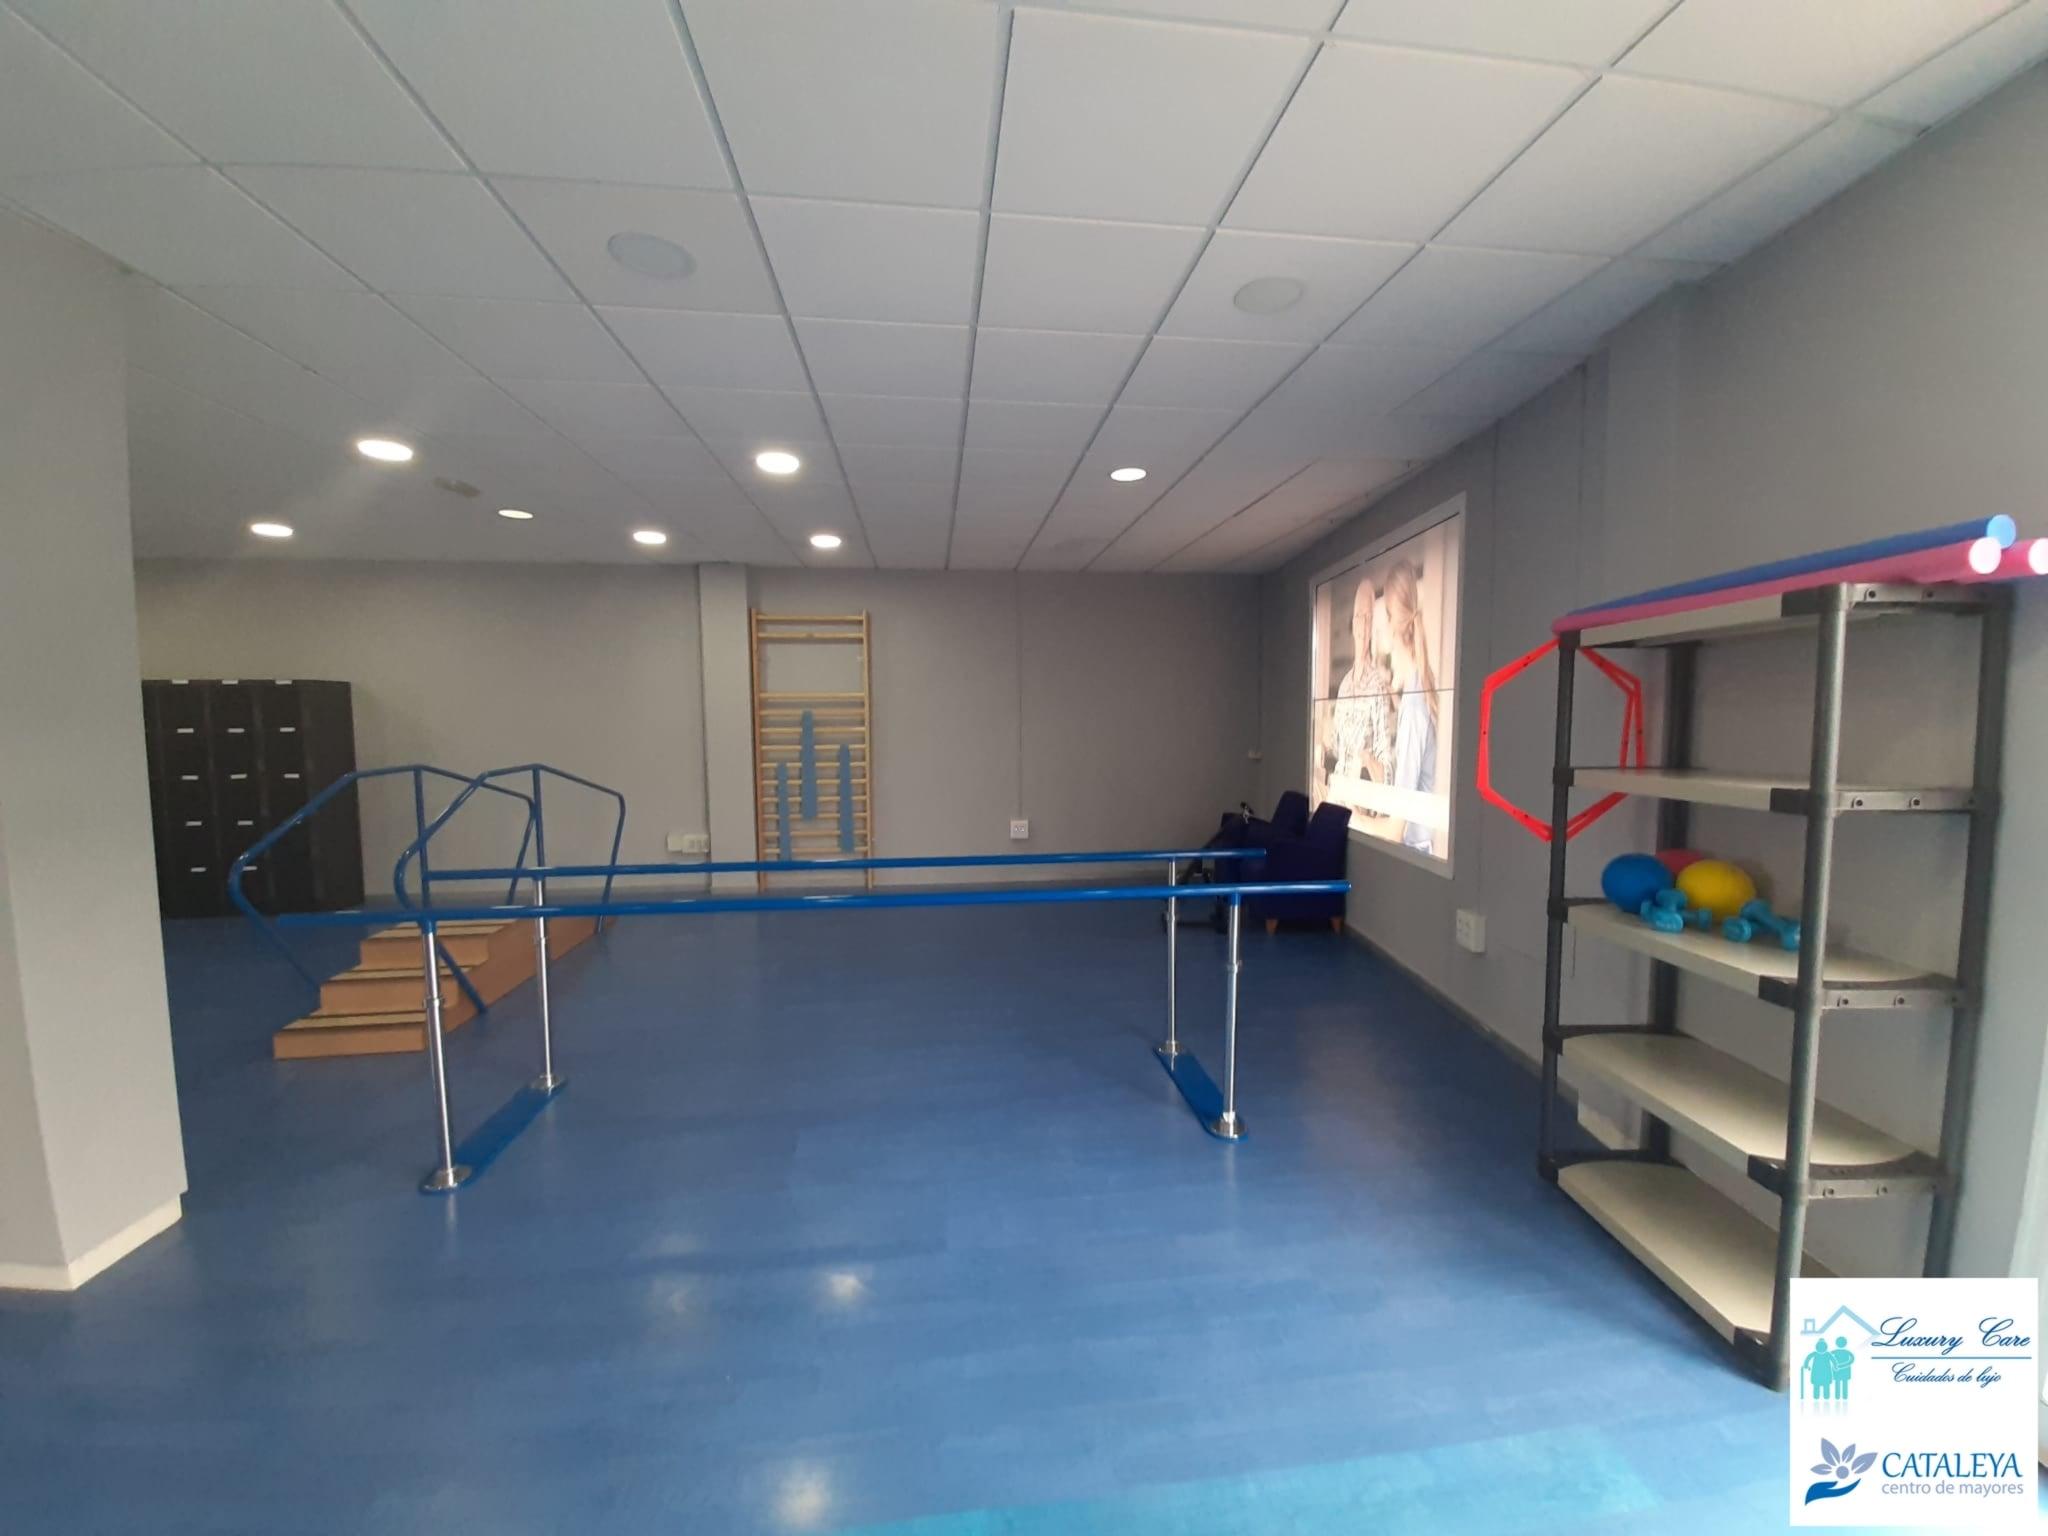 Centro_de_mayores_Cataleya_Gimnasio_3